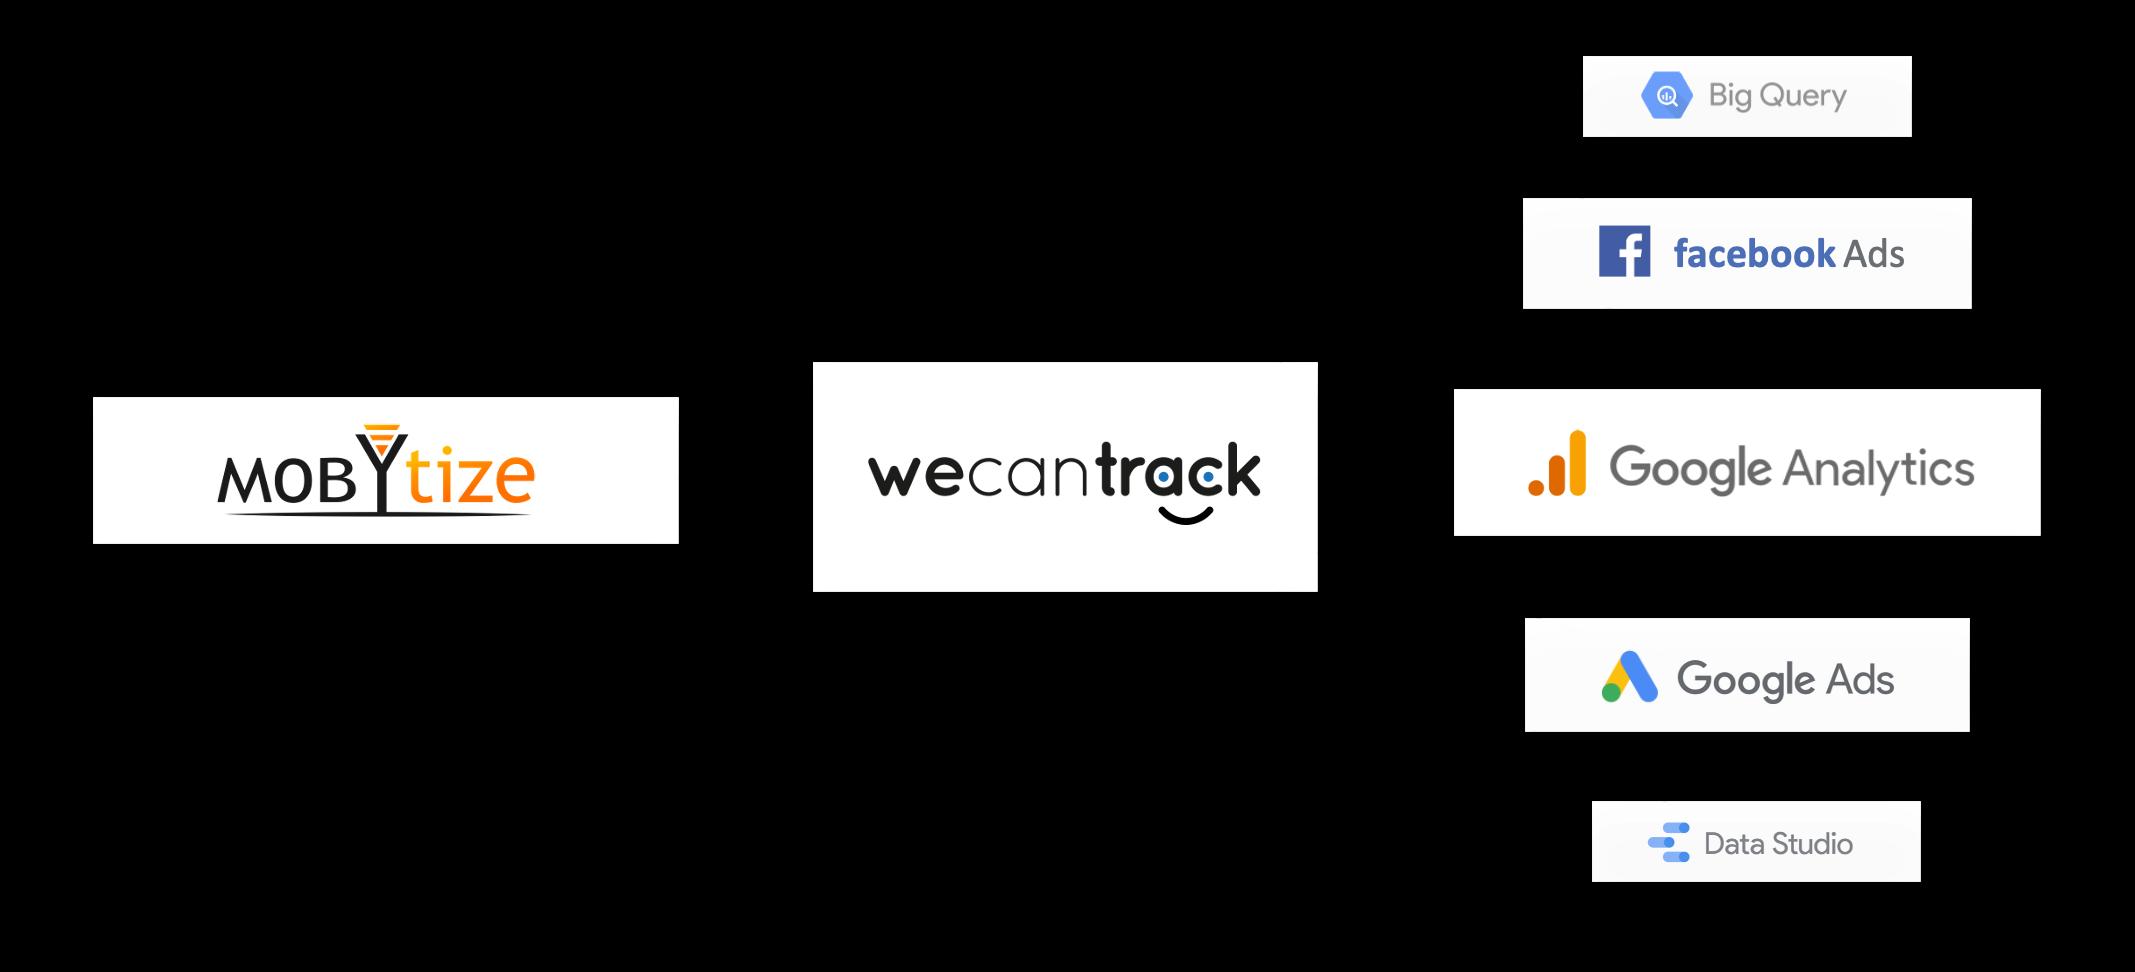 integrate-mobytize-affiliate-conversions-via-postback